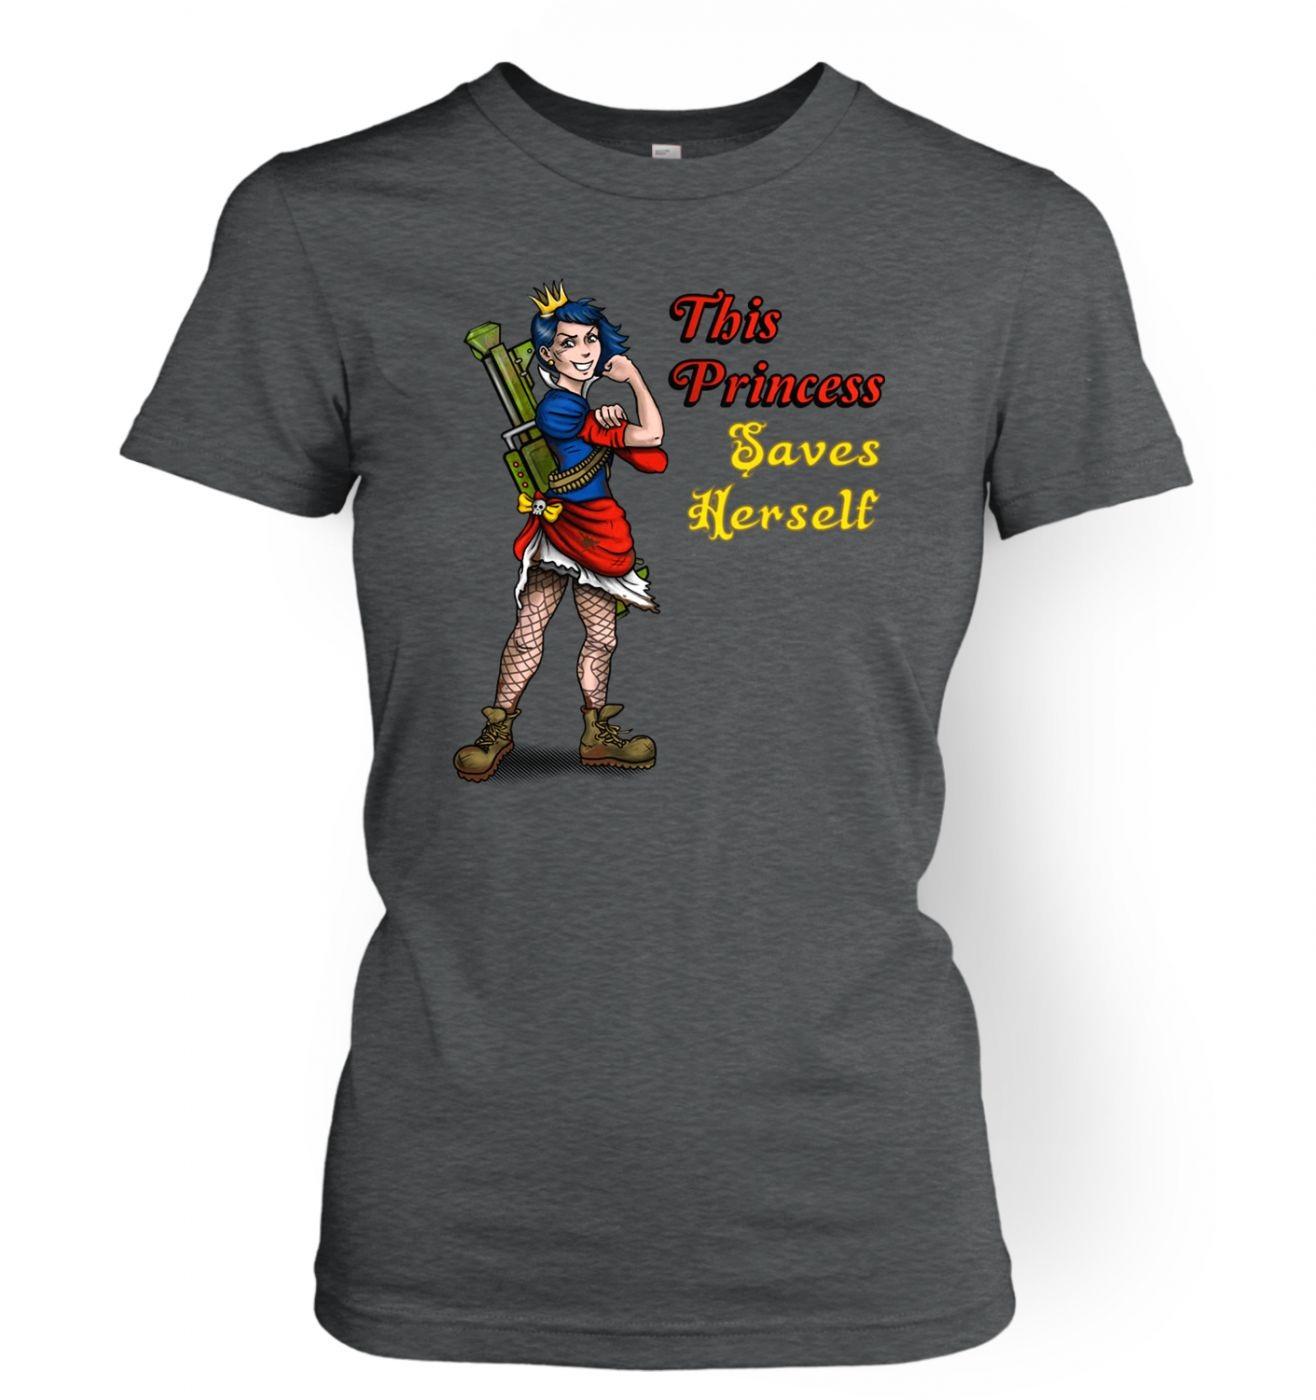 This Princess Saves Herself women's t-shirt